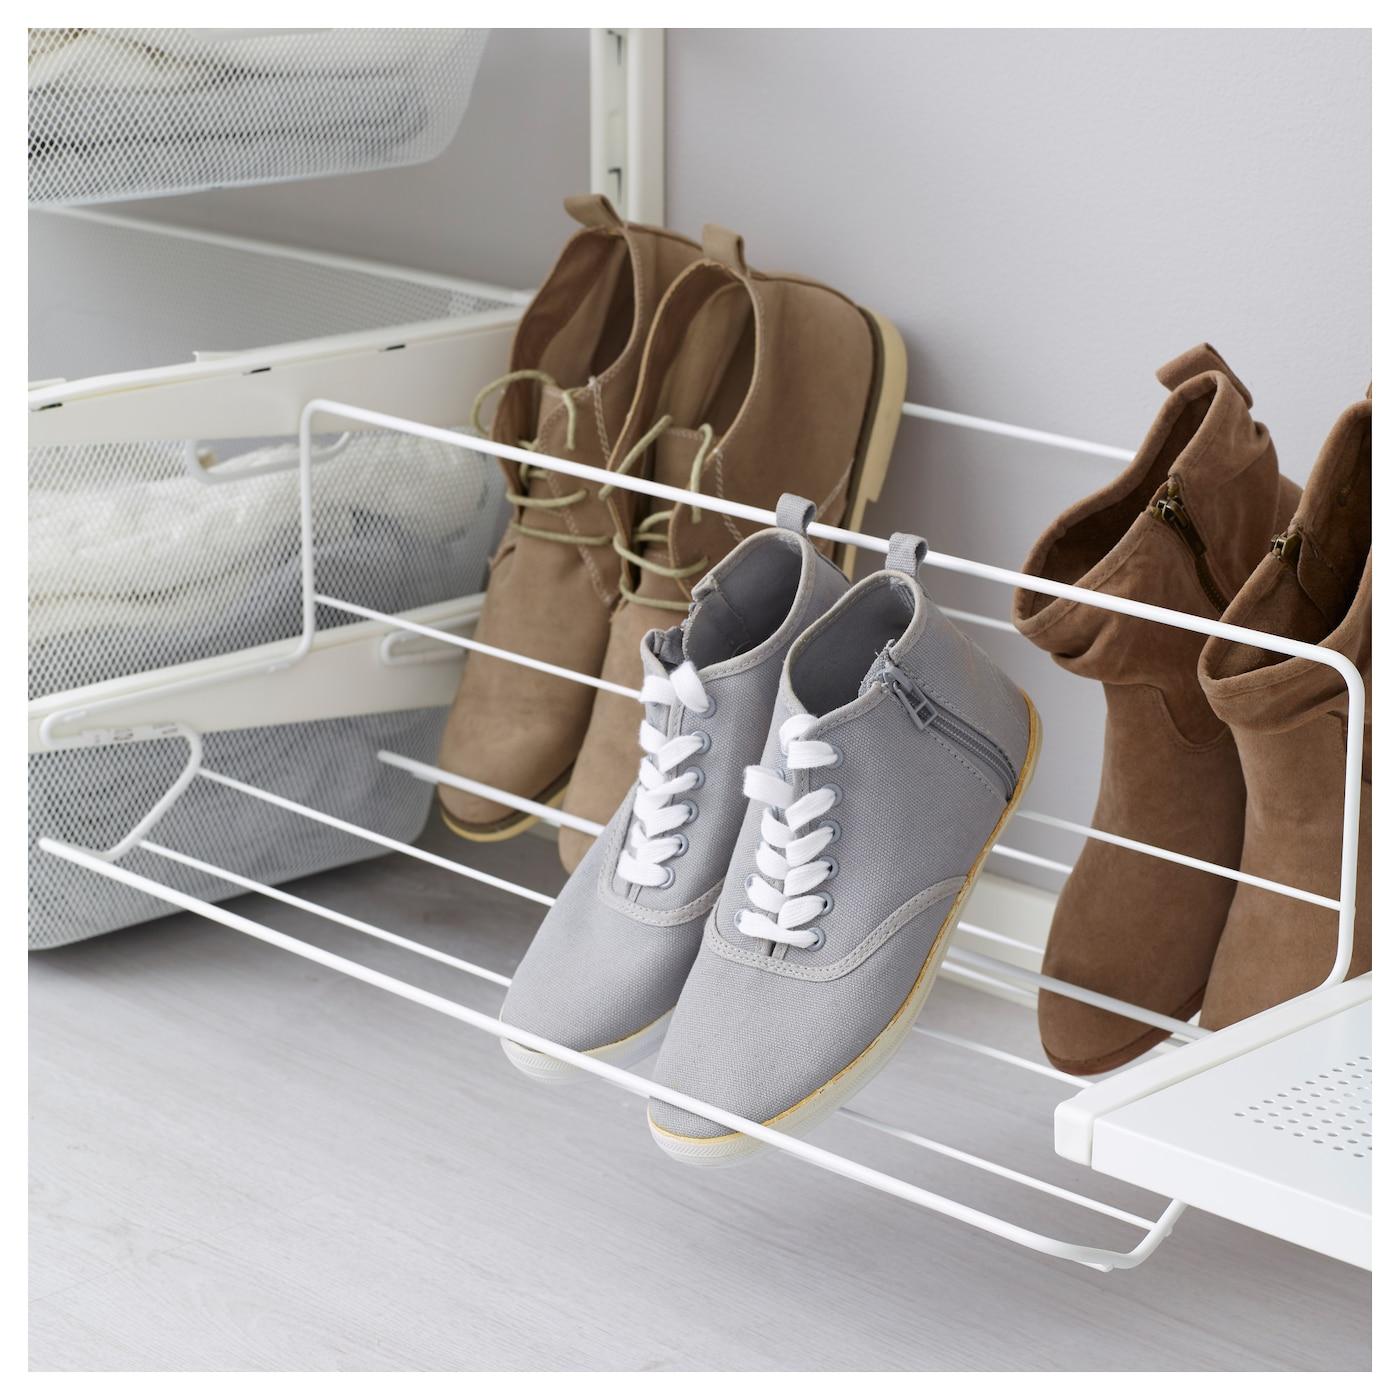 algot shoe organiser white 60 cm ikea. Black Bedroom Furniture Sets. Home Design Ideas